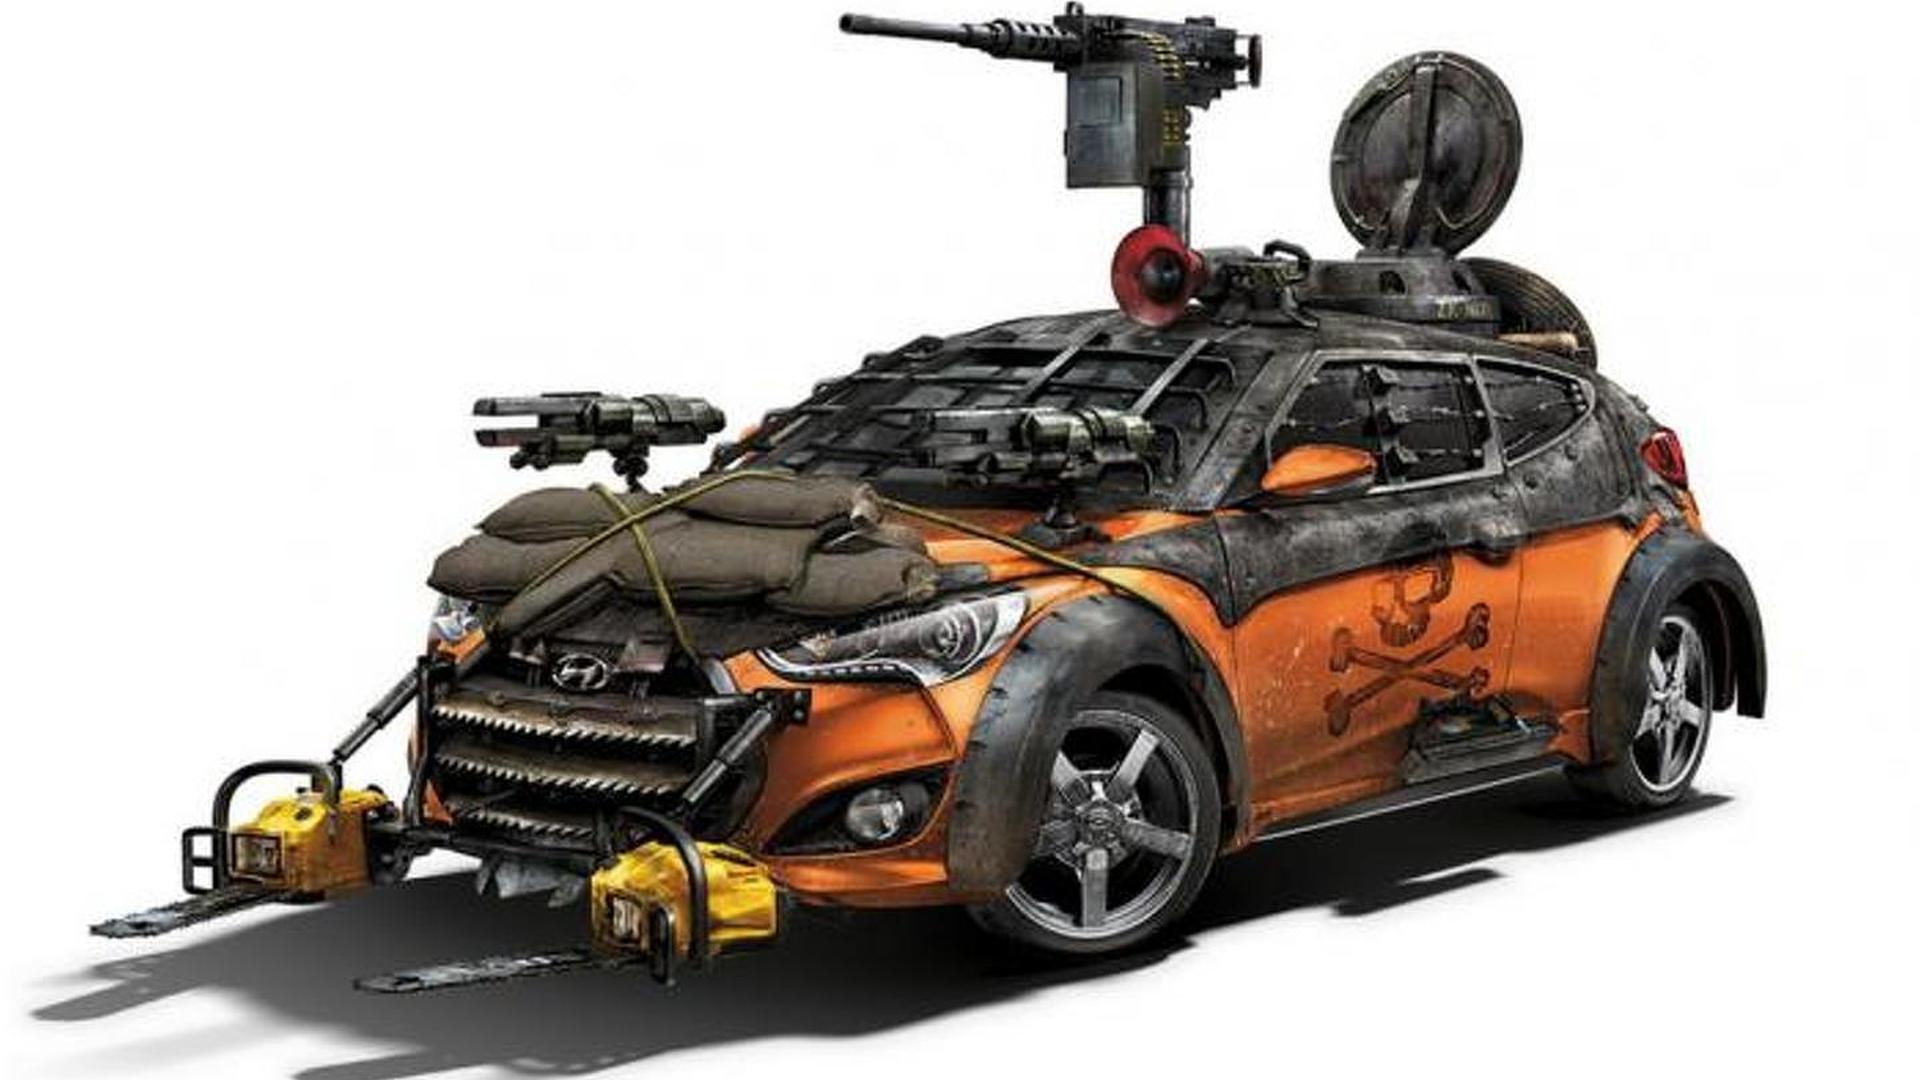 Hyundai Veloster Zombie Survival Machine revealed at Comic-Con